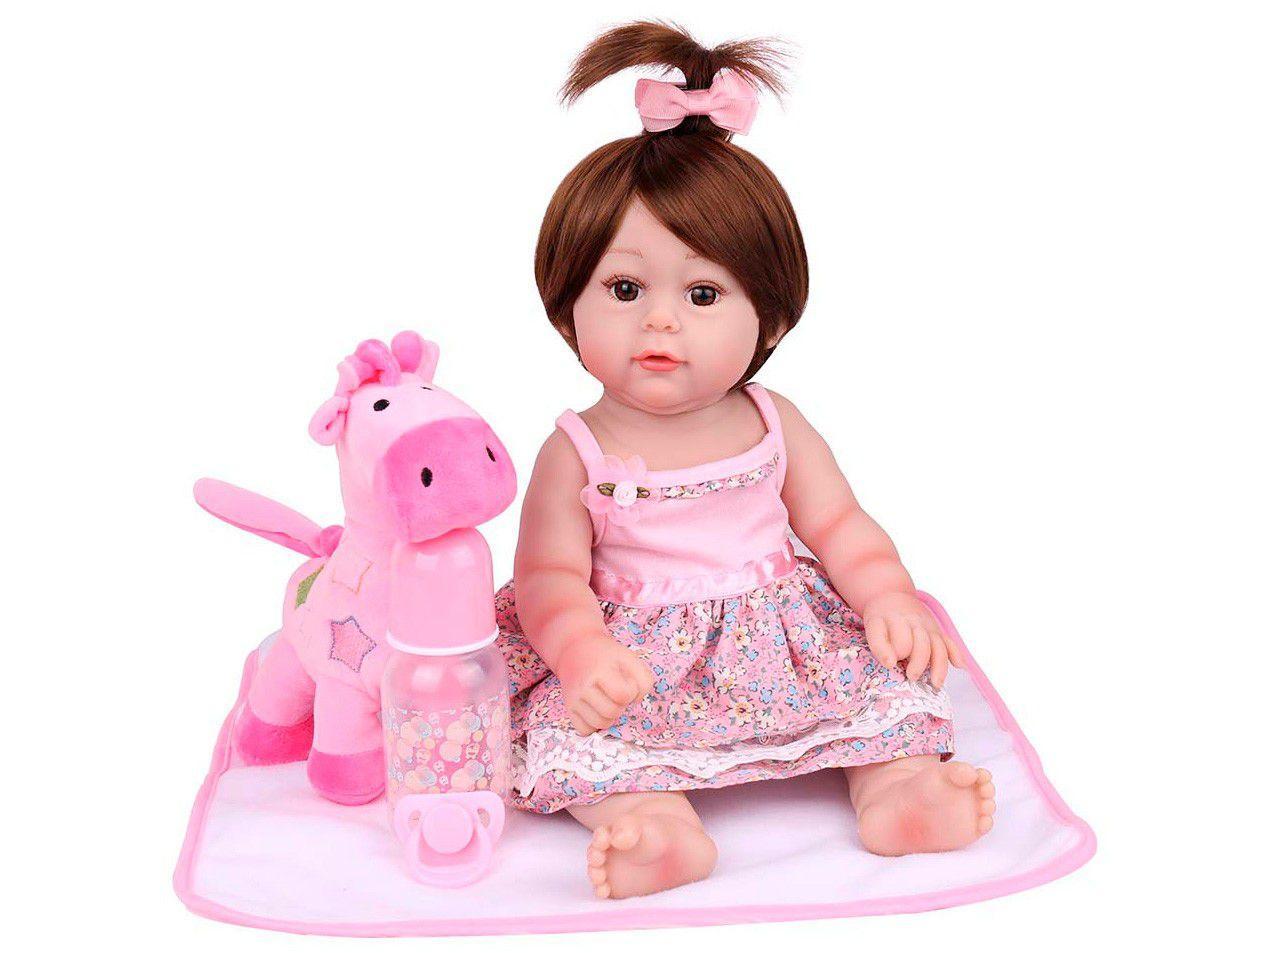 Boneca Reborn Luiza Girafinha 45cm com Acessórios - Laura Baby